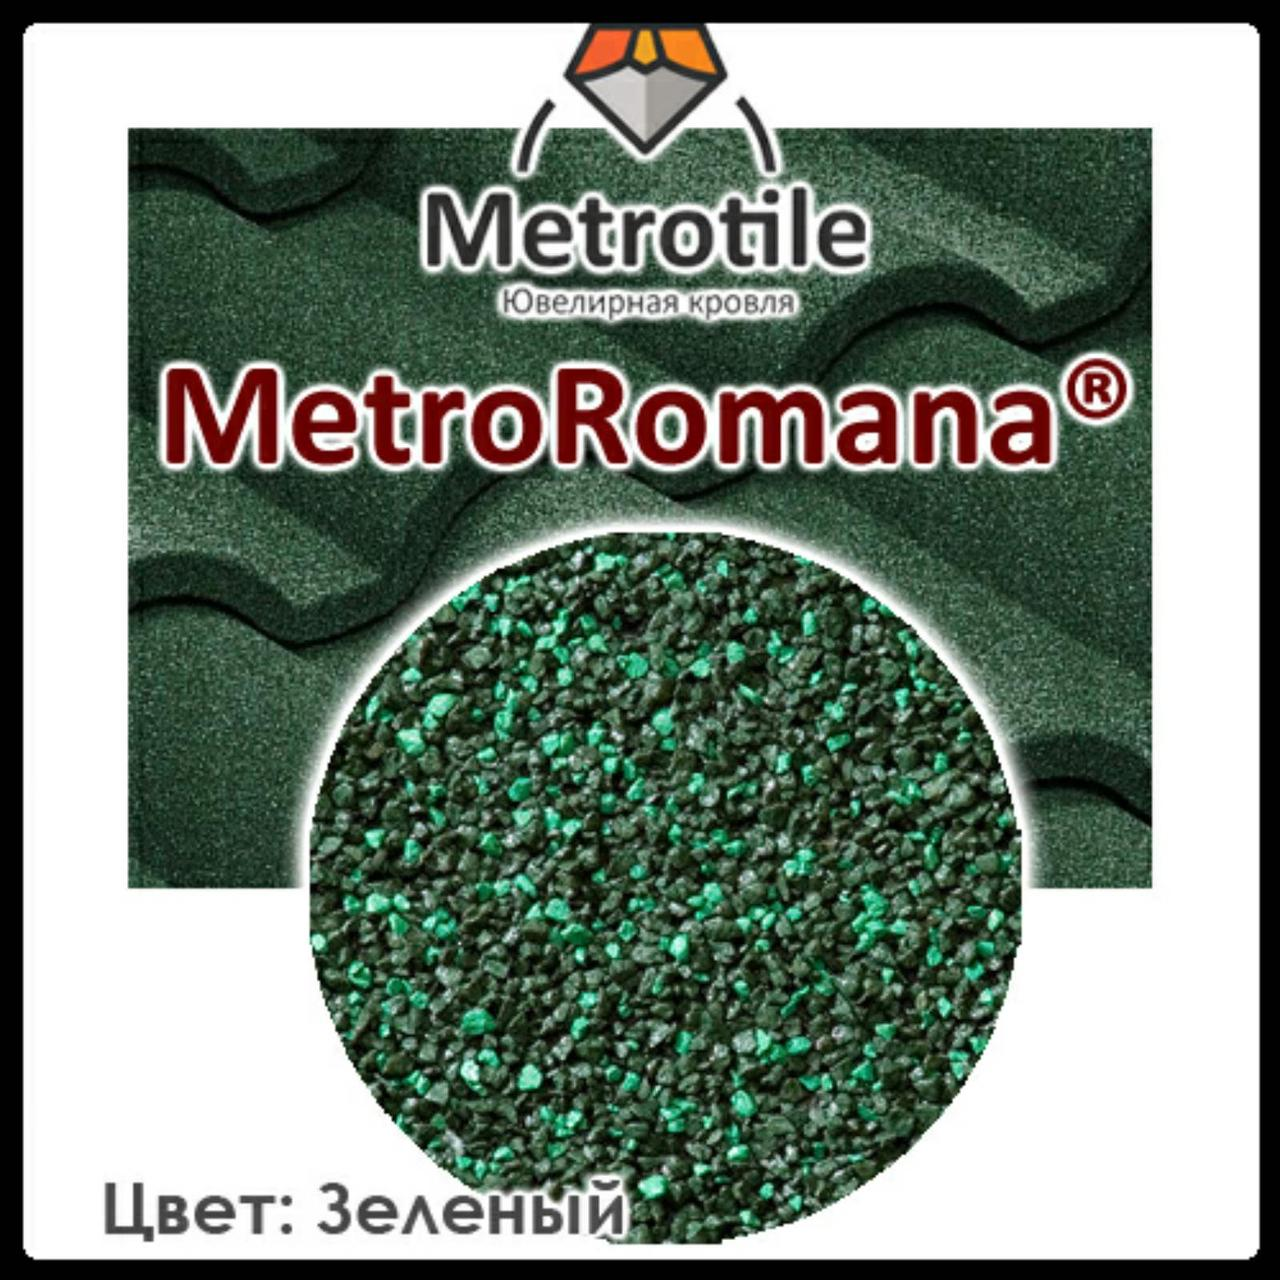 Композитная черепица Metrotile Romana → Moss Green